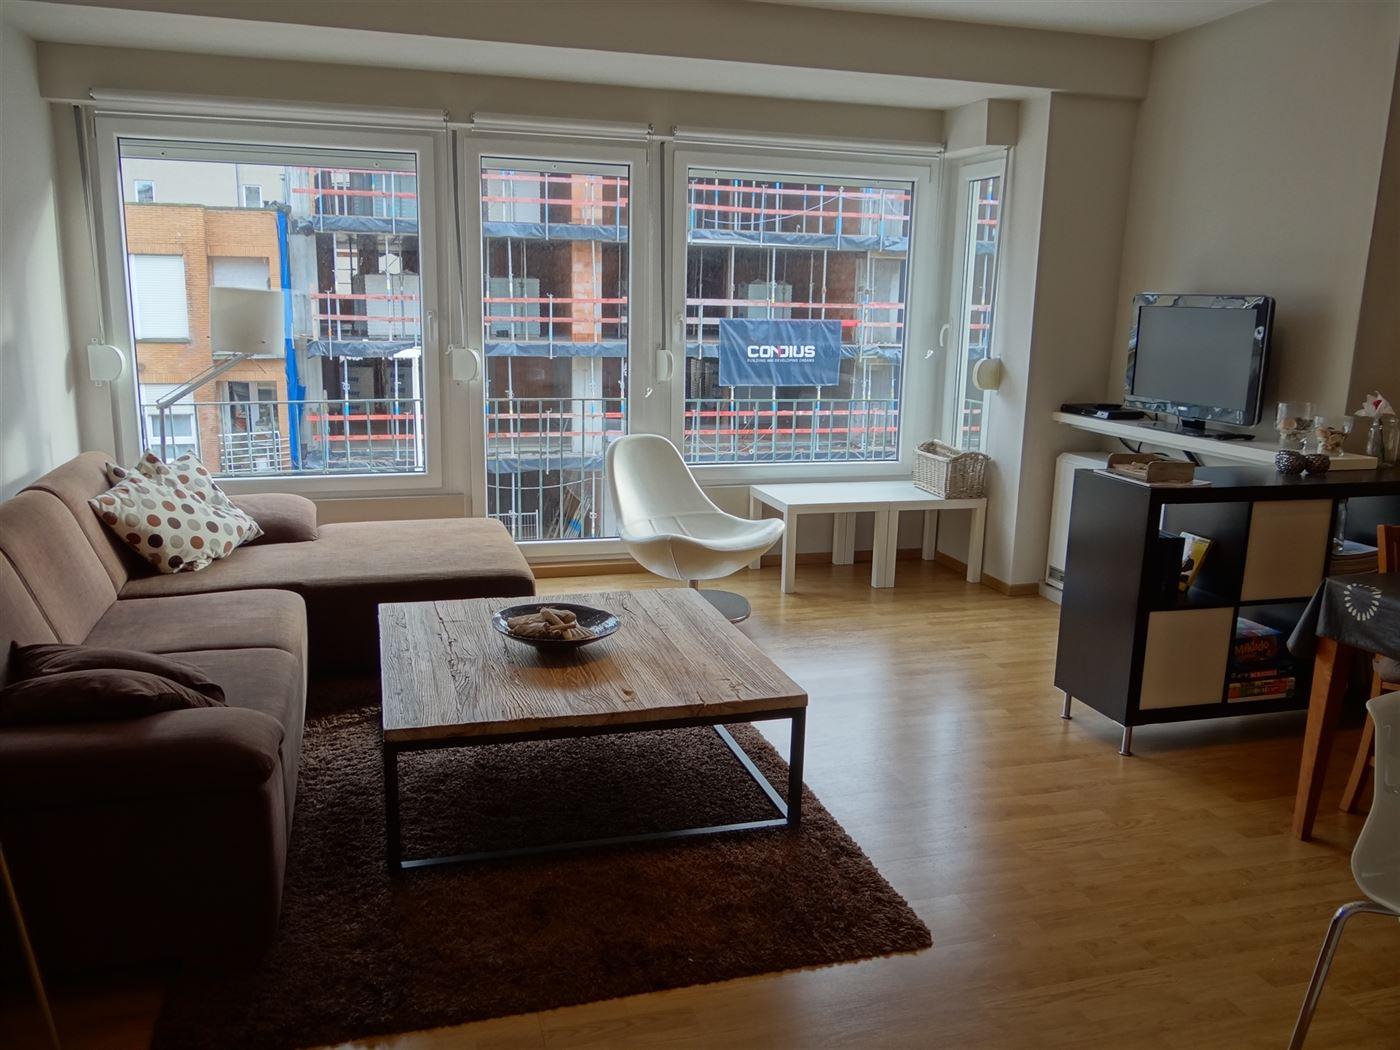 TE HUUR OP JAARBASIS - mooi gerenoveerd appartement - zonnekant - ingerichte keuken - 1 slaapkamer met 1x2 bed - 1 slaapkamer met stapelbed 2x1 - inge...